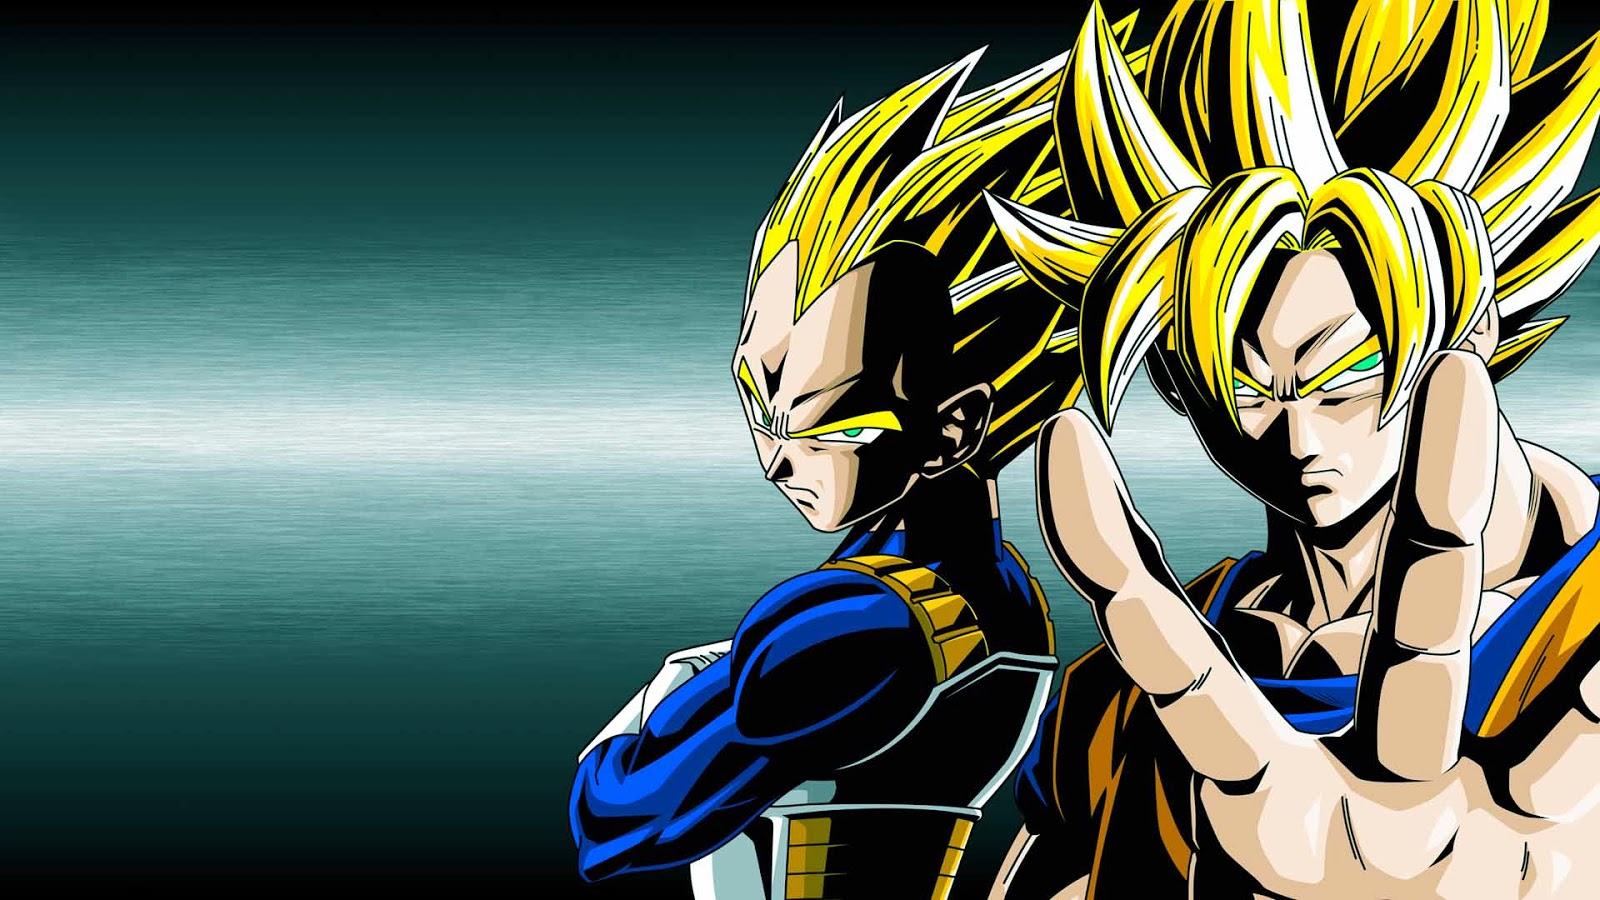 Super Saiyan 1 Goku Vegeta Wallpaper 1600x900